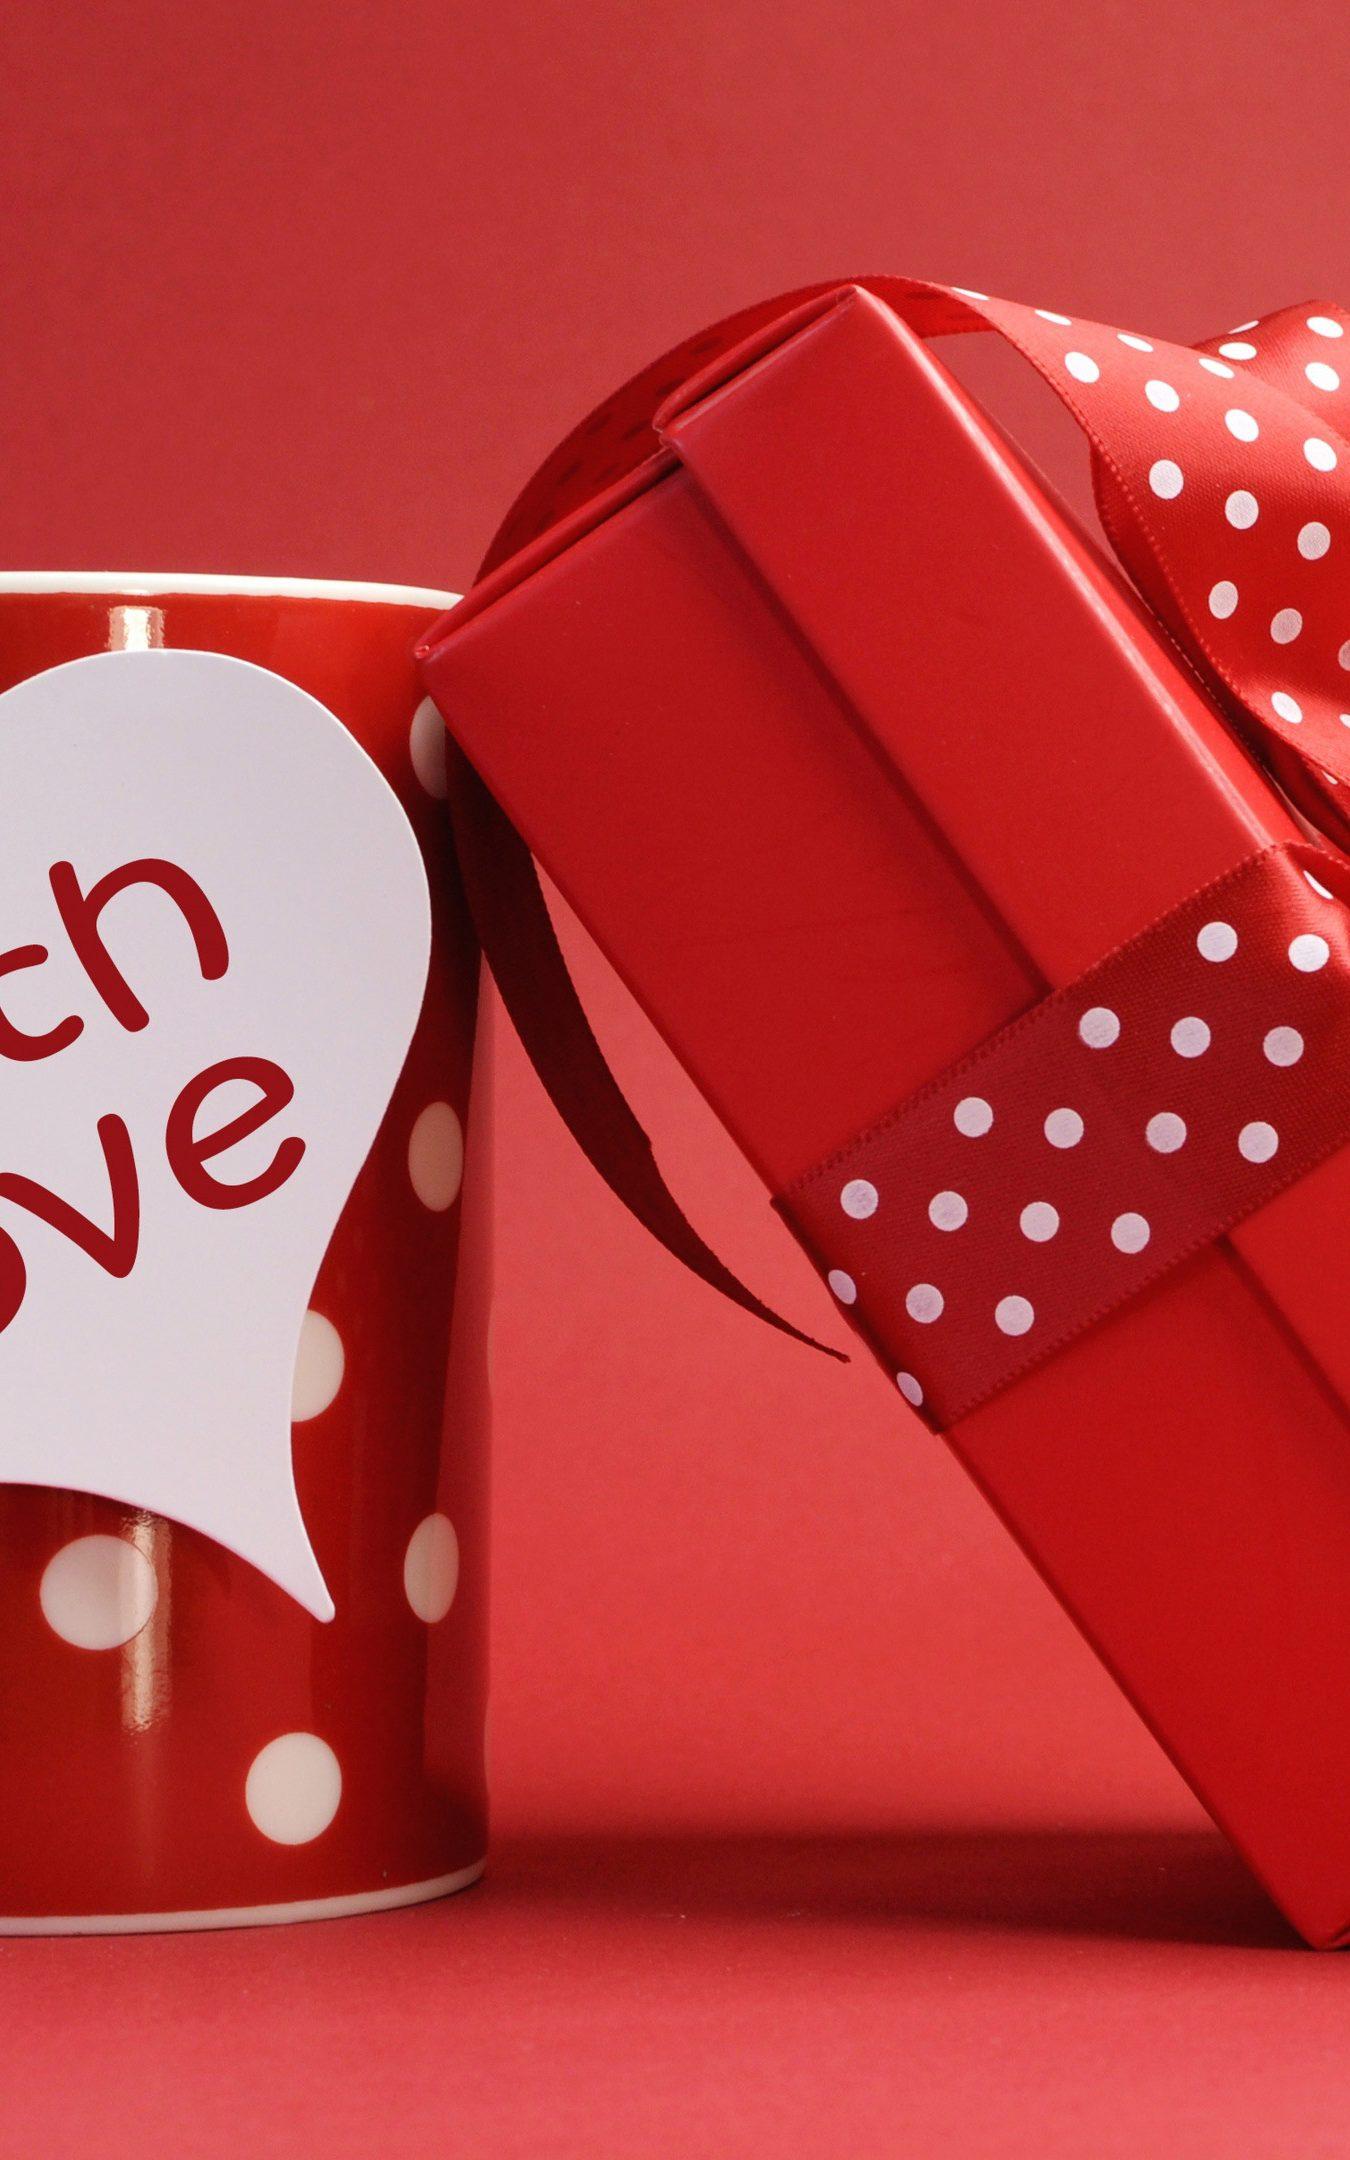 Red mug gift love 4k wallpaper best wallpapers apple negle Images